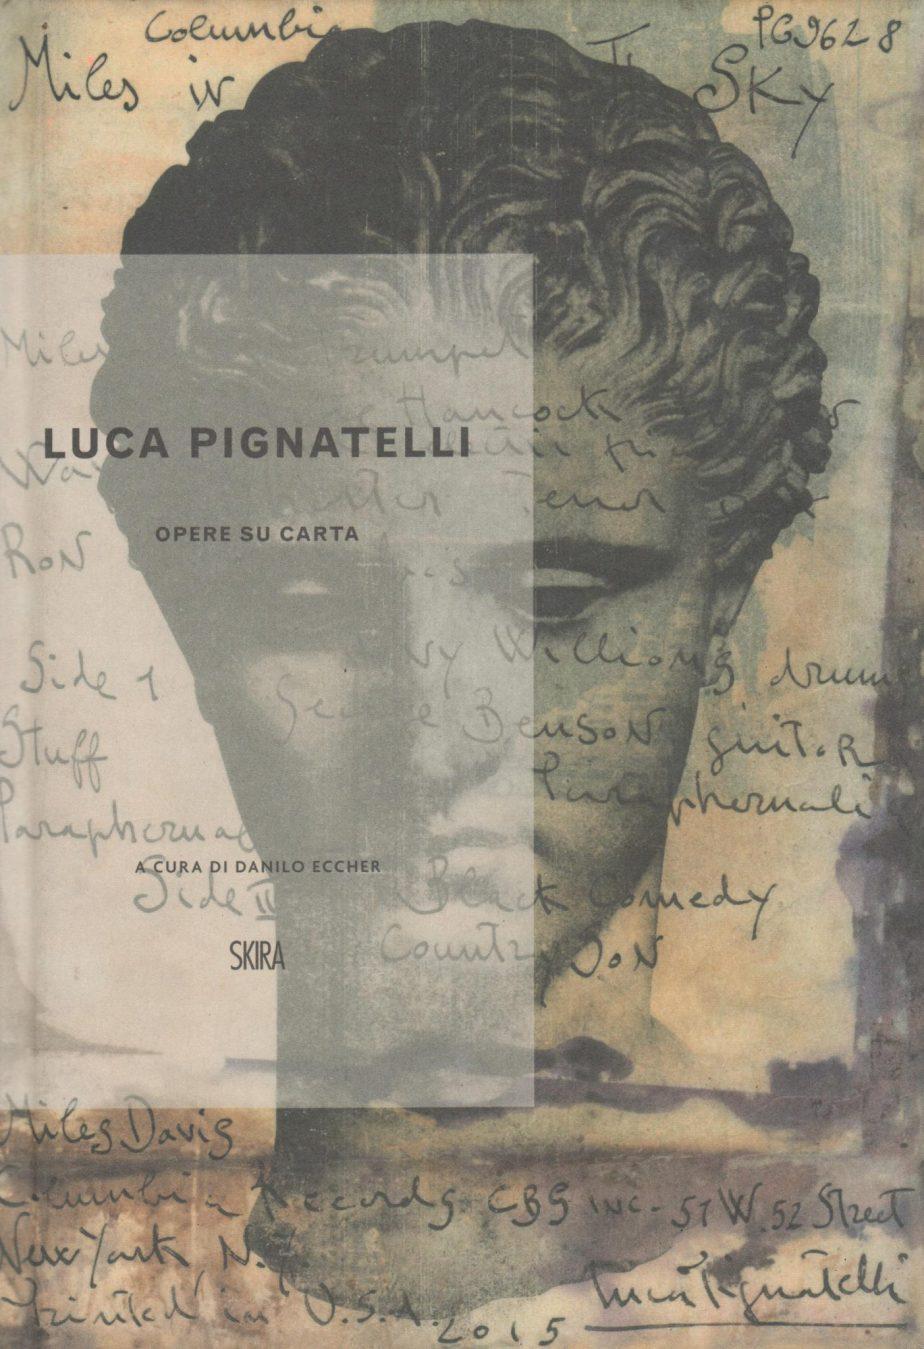 Luca Pignatelli : opere su carta